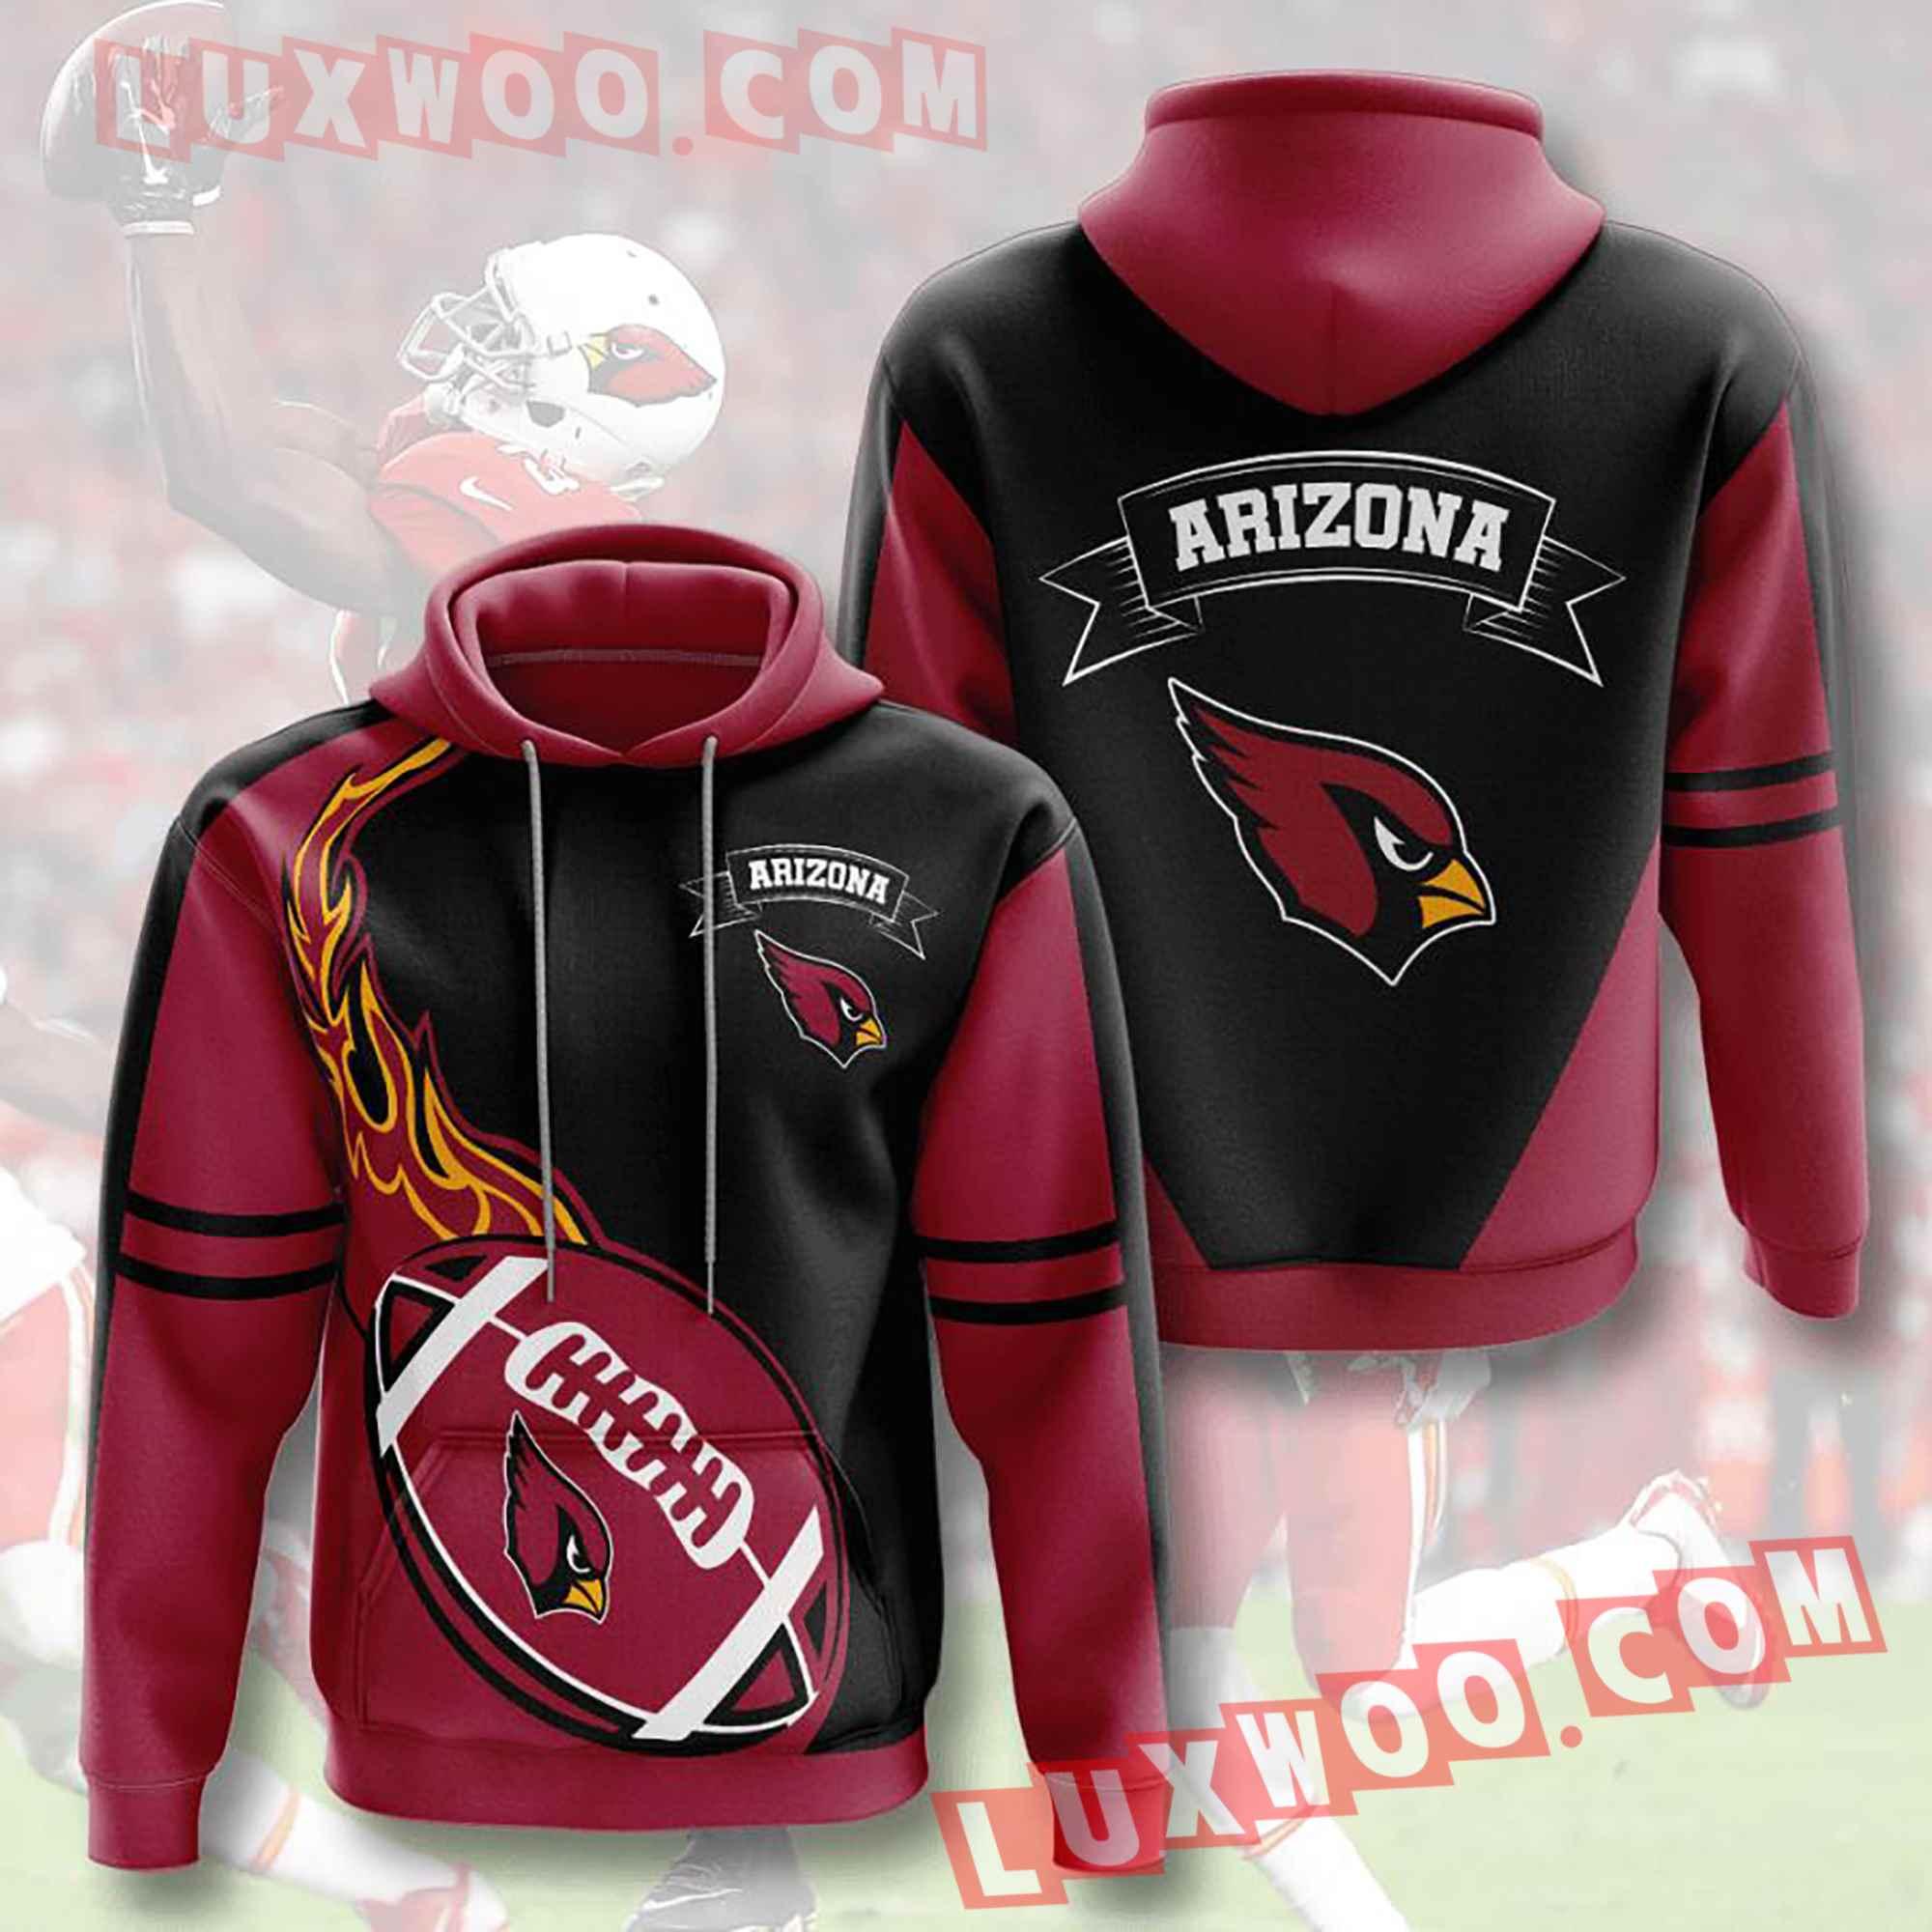 Nfl Arizona Cardinals Hoodies Custom All Over Print 3d Pullover Hoodie V14